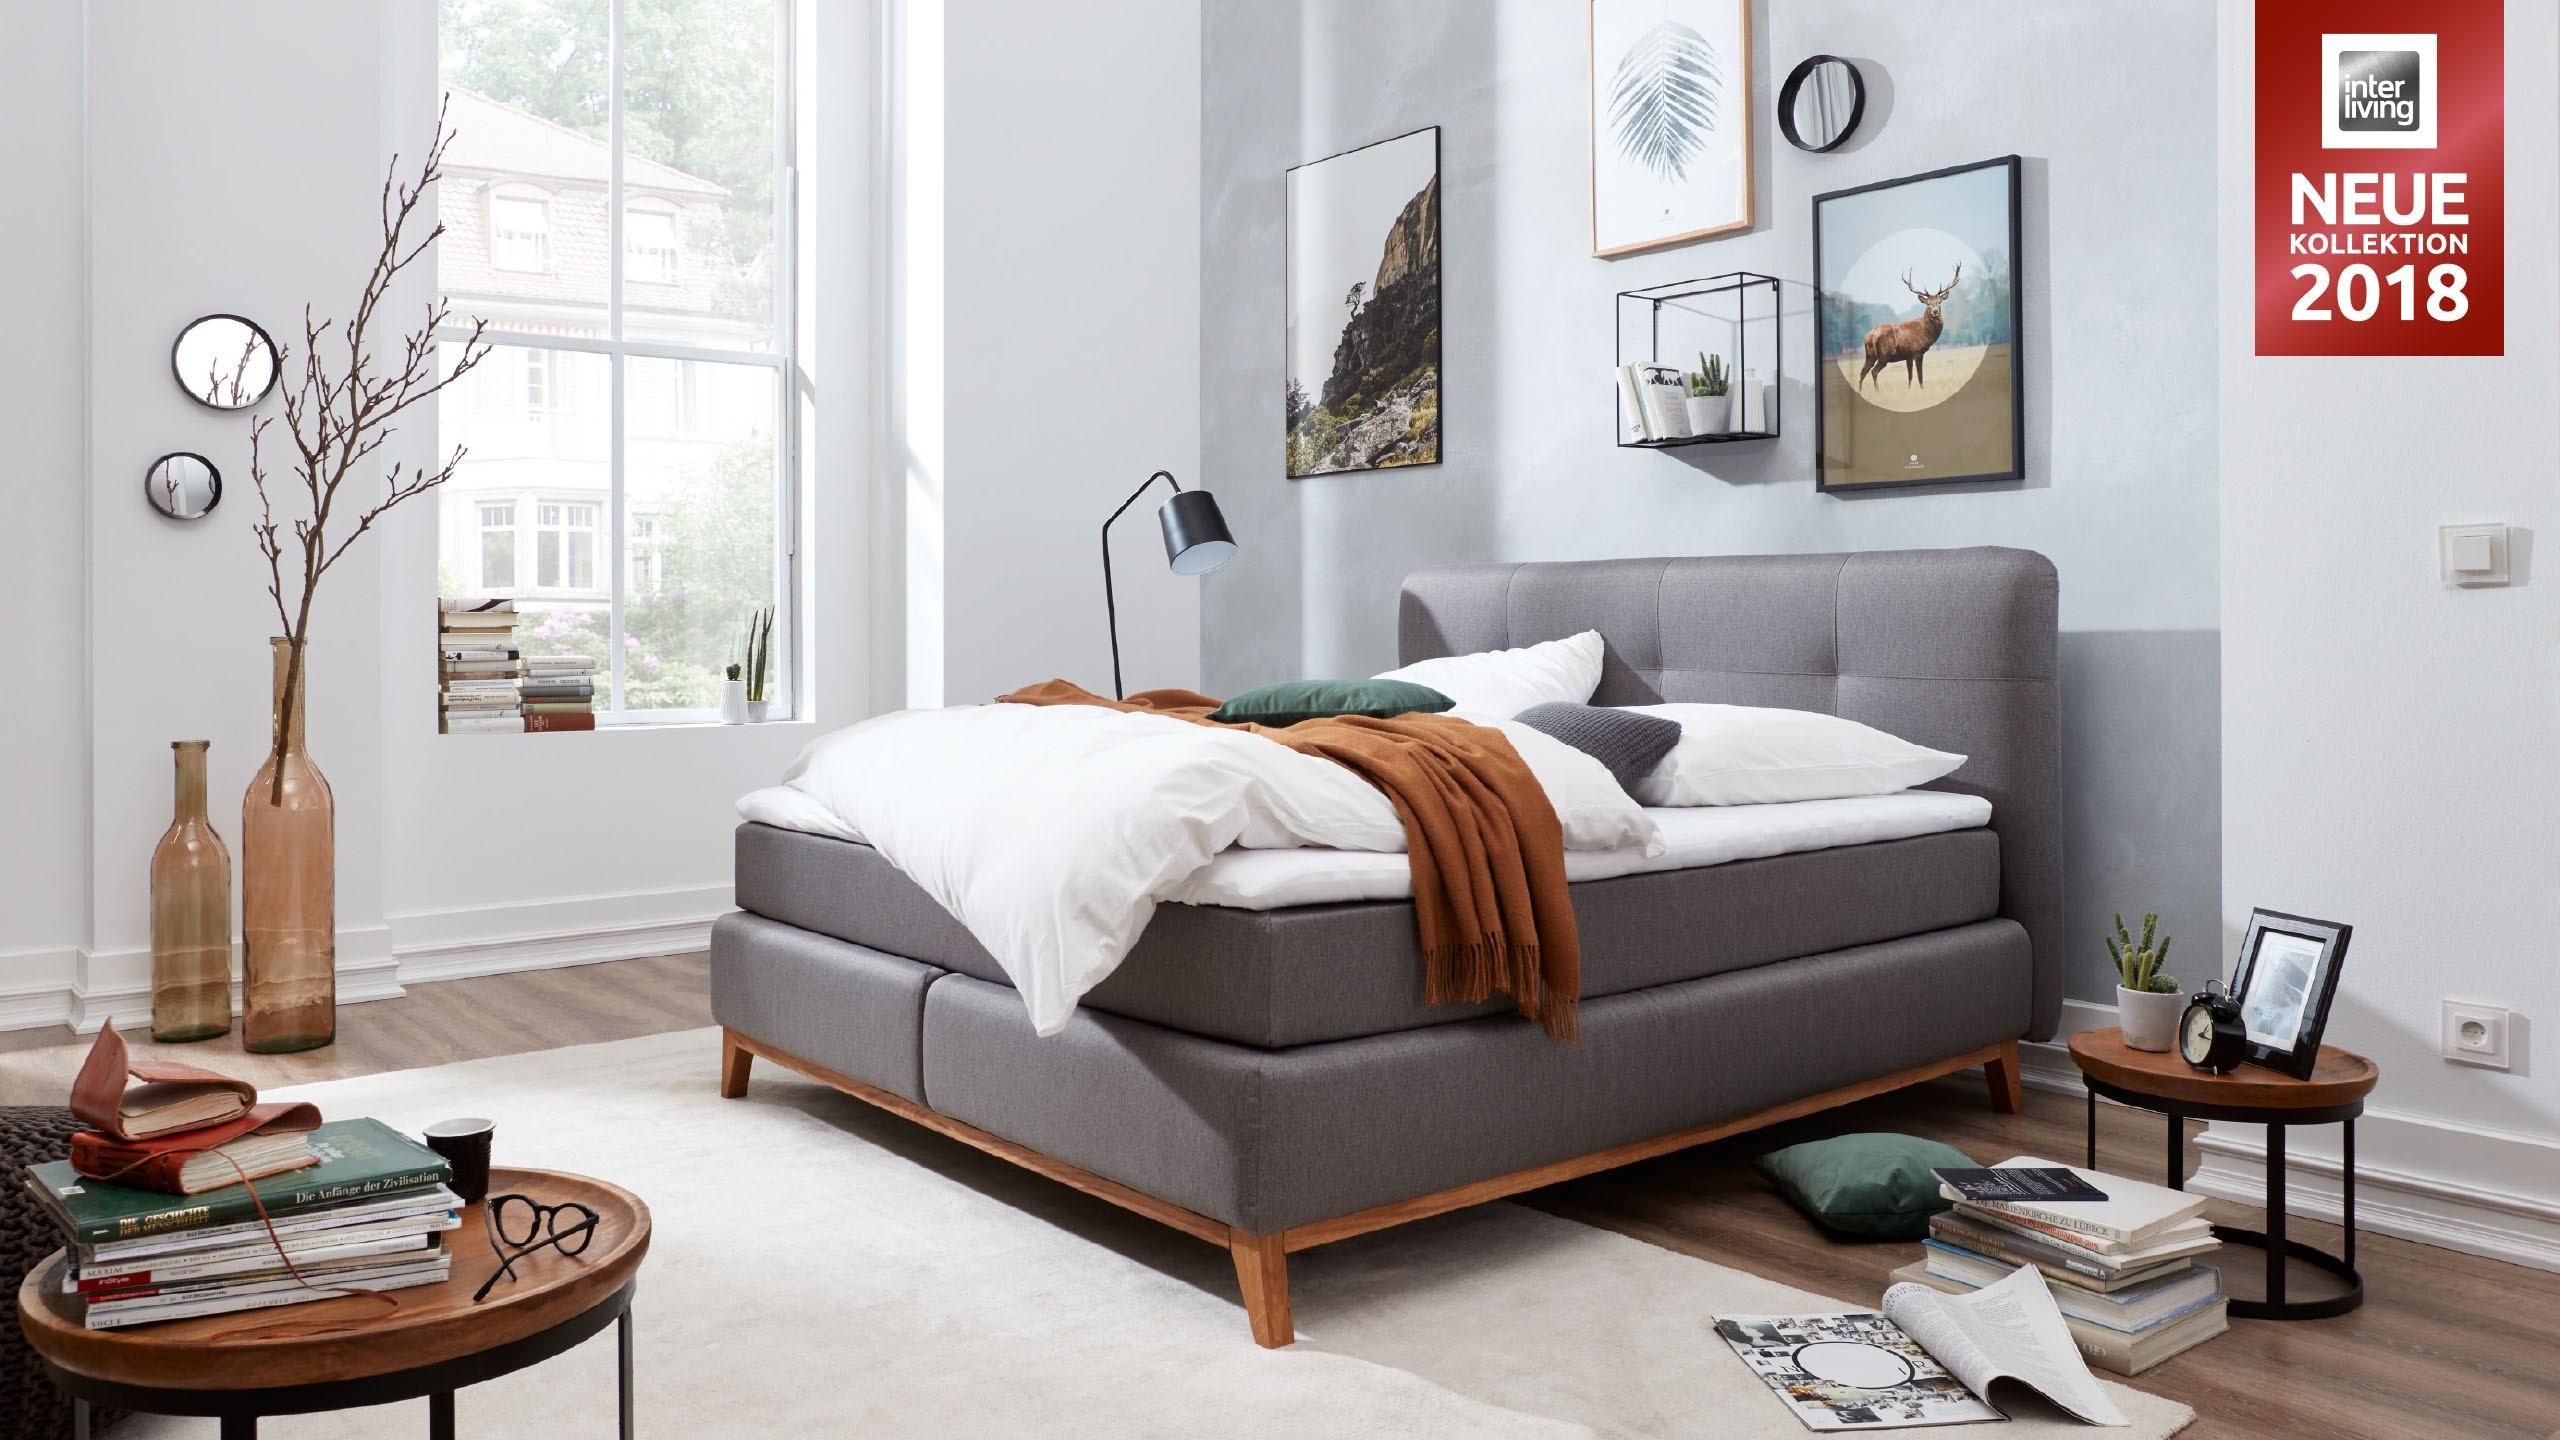 interliving boxspringbett serie 1406 glei ner. Black Bedroom Furniture Sets. Home Design Ideas